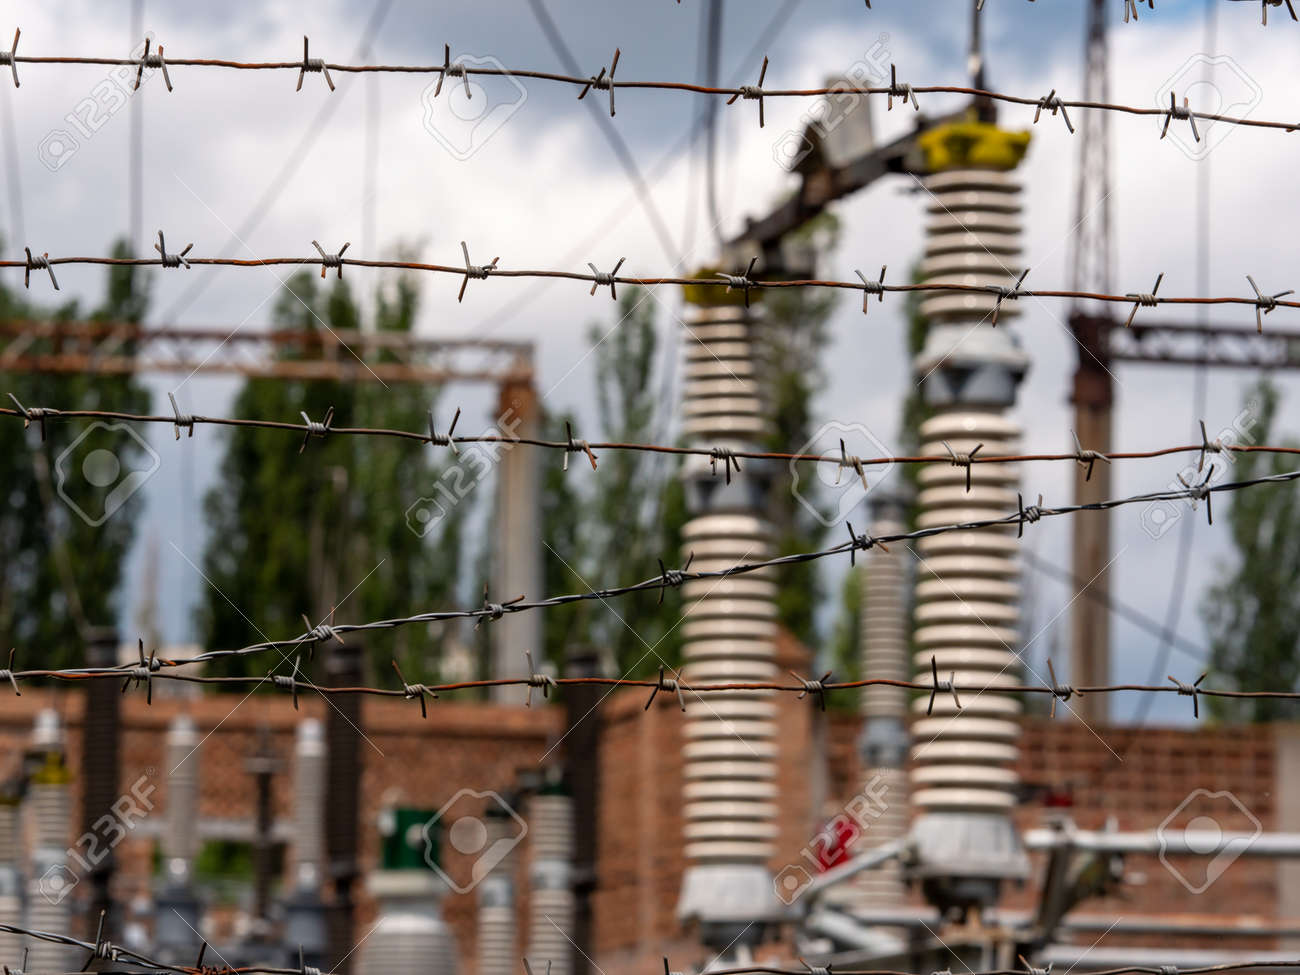 Transformer station near the power station. - 149743455